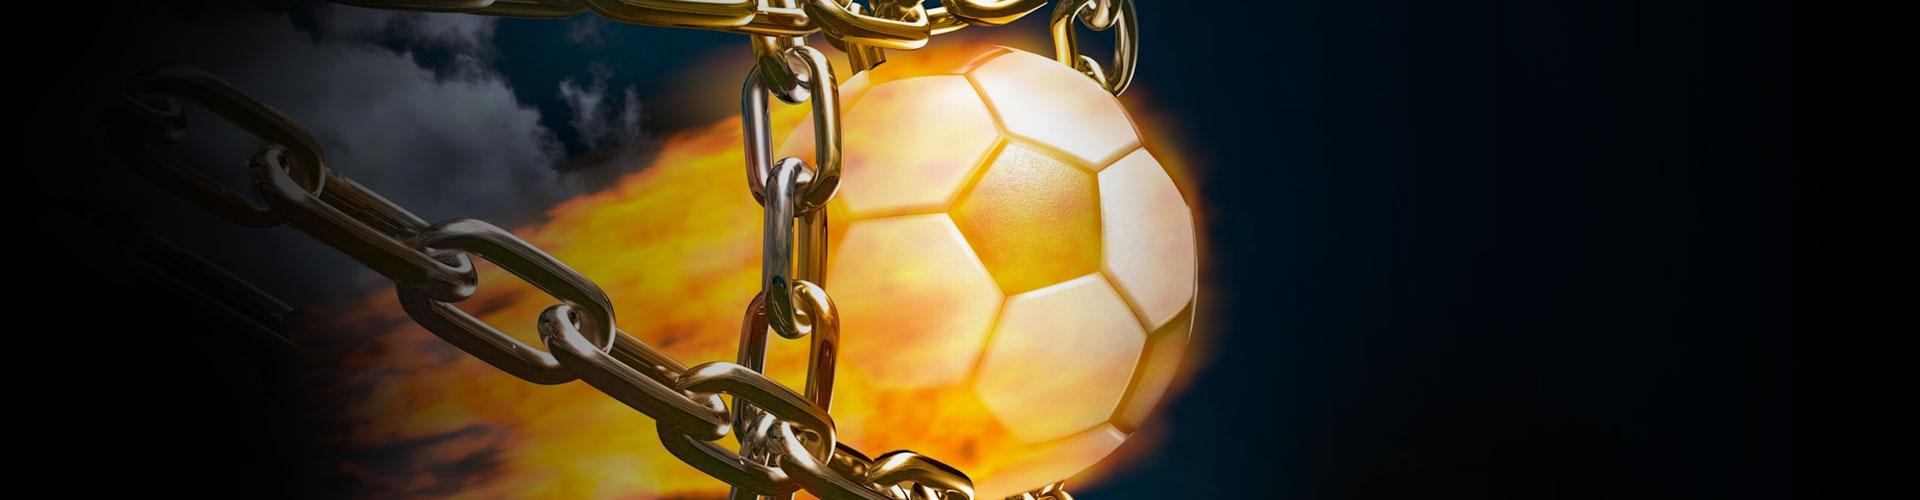 bwin bet at home sportwetten